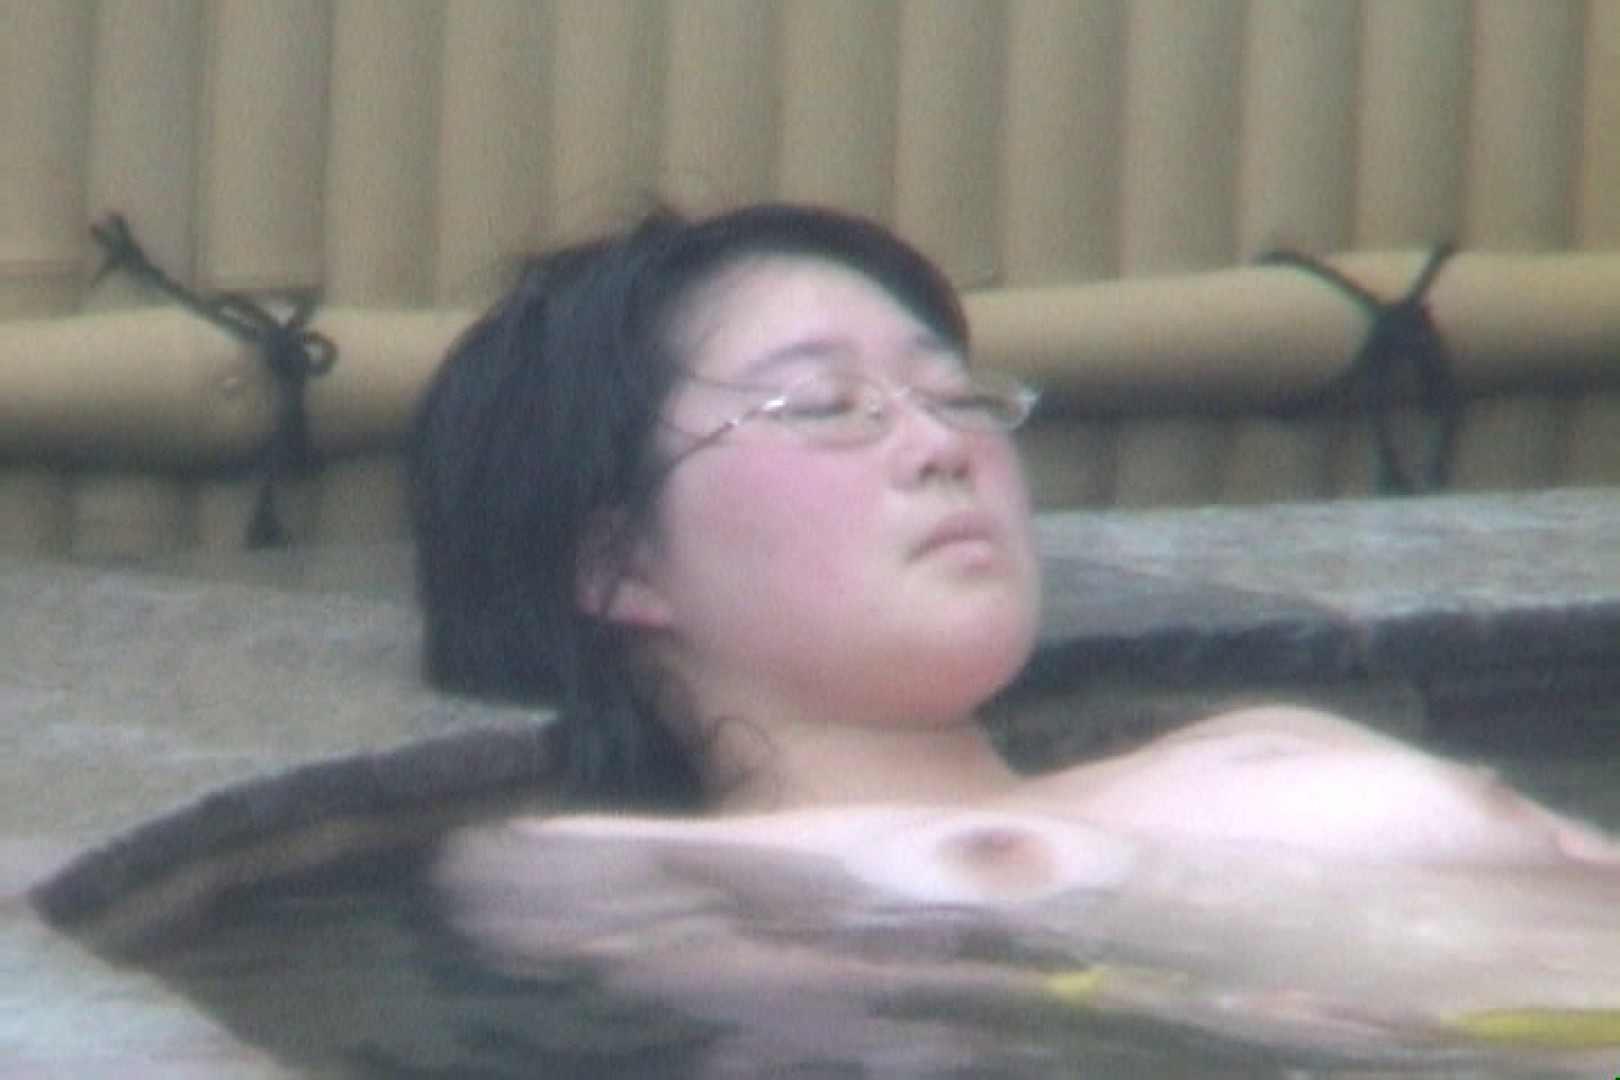 Aquaな露天風呂Vol.46【VIP限定】 女体盗撮 | 露天  98連発 16